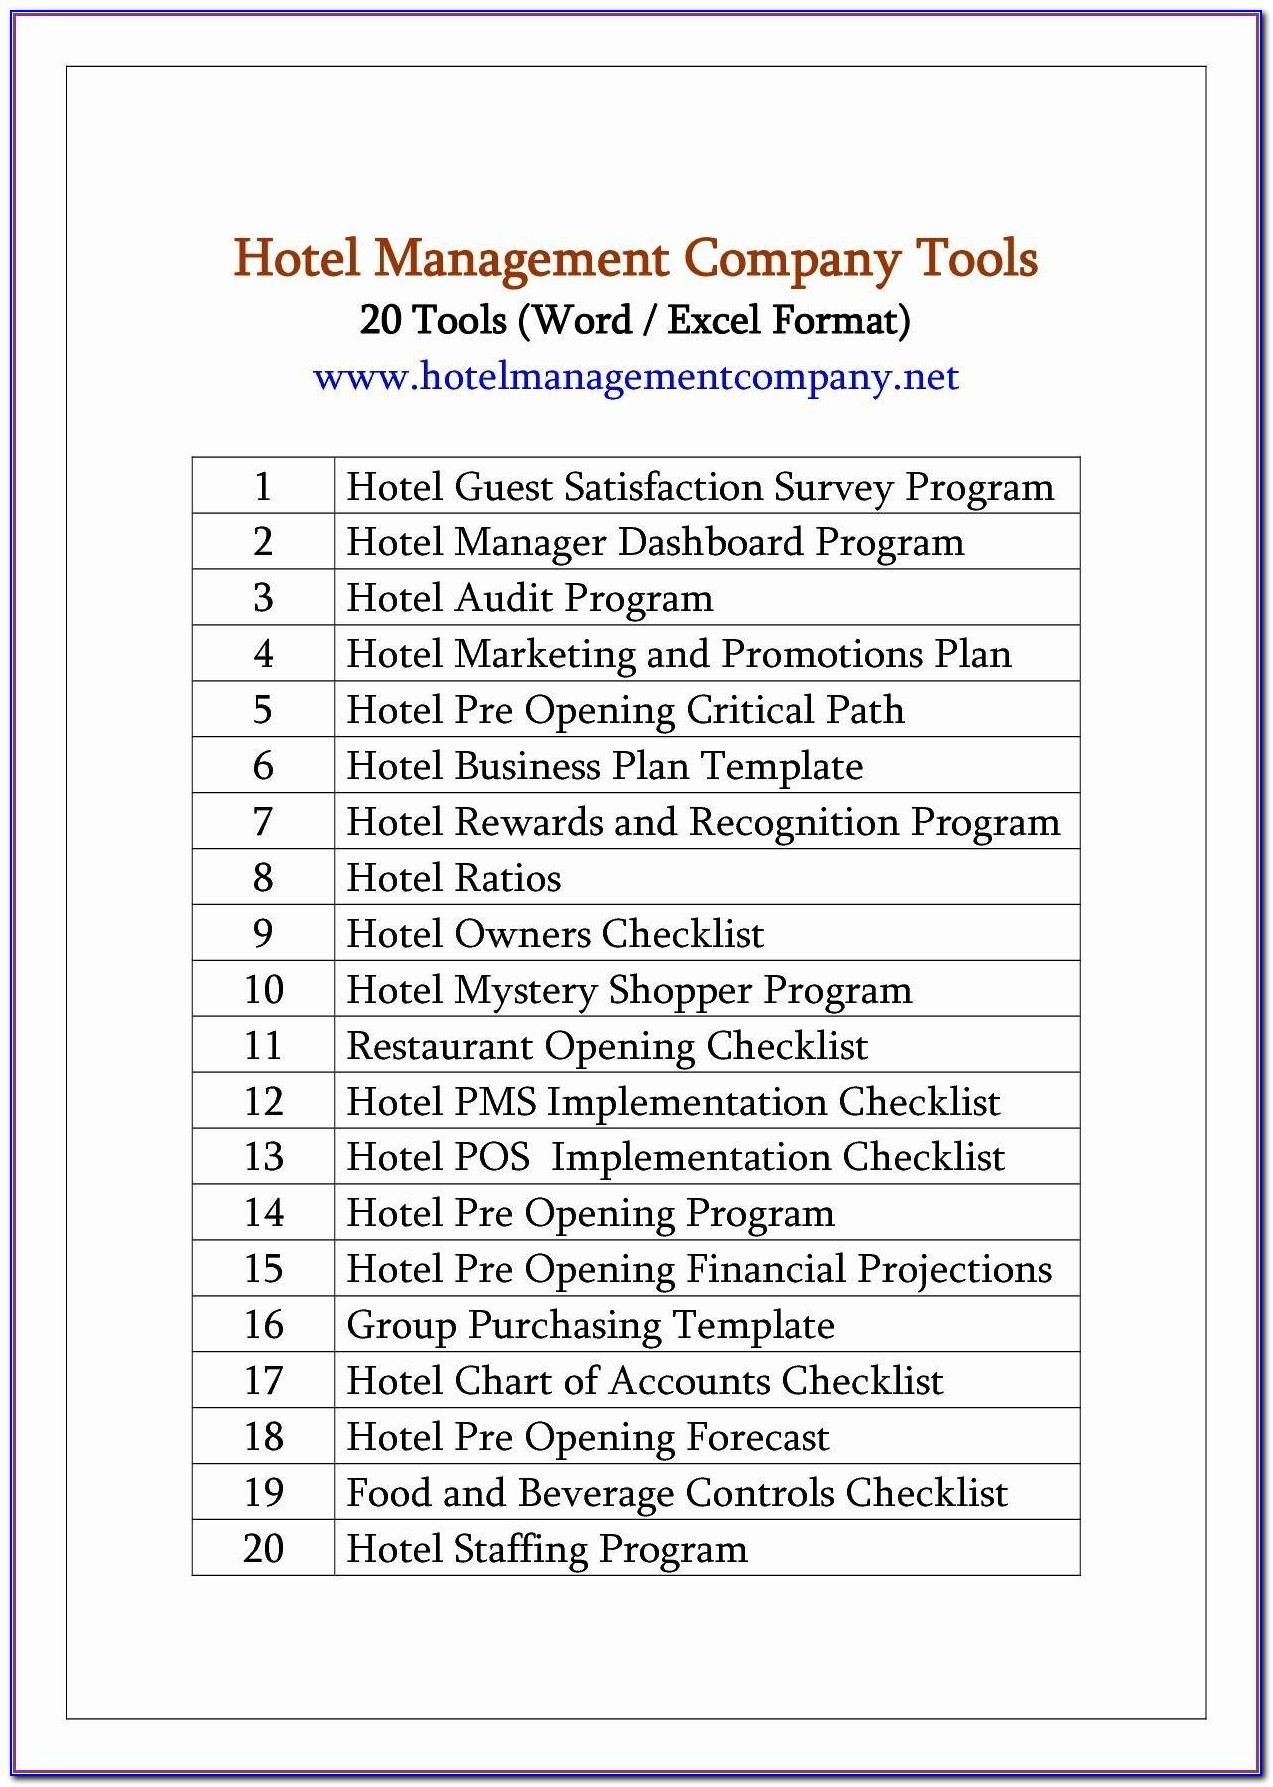 Excel Tabelle Mac Und Business Plan Template Mac ? Business Plan Template Free Word Mac